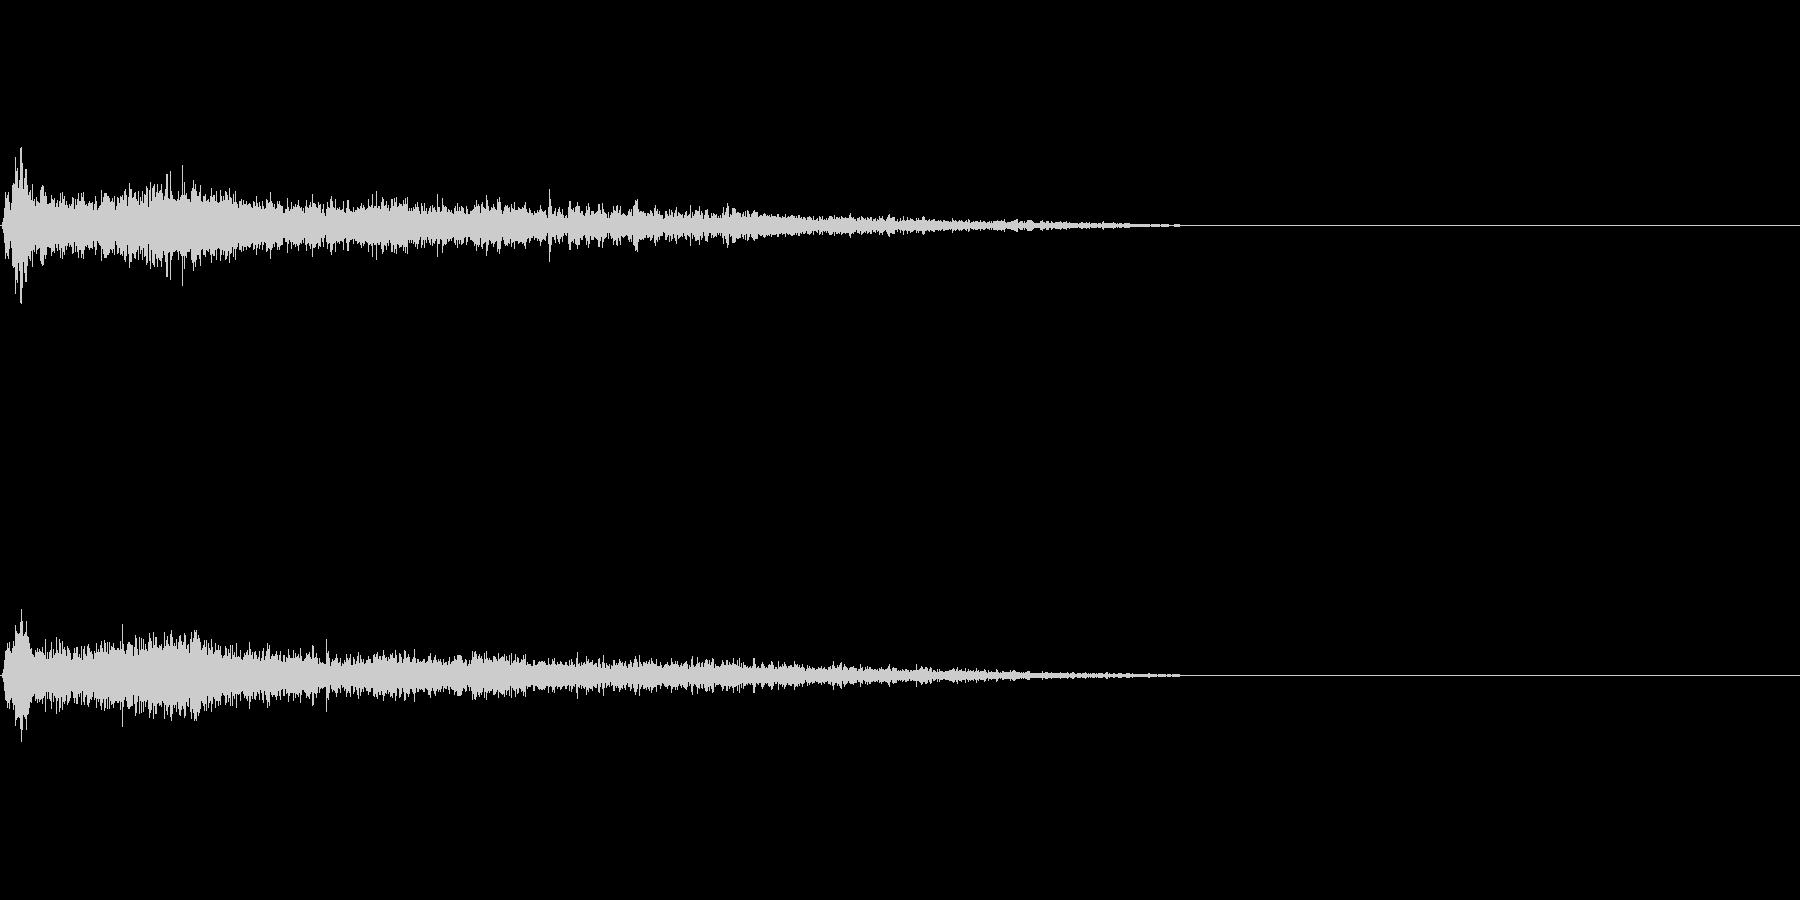 A♯メジャー インパクト音 衝撃音の未再生の波形